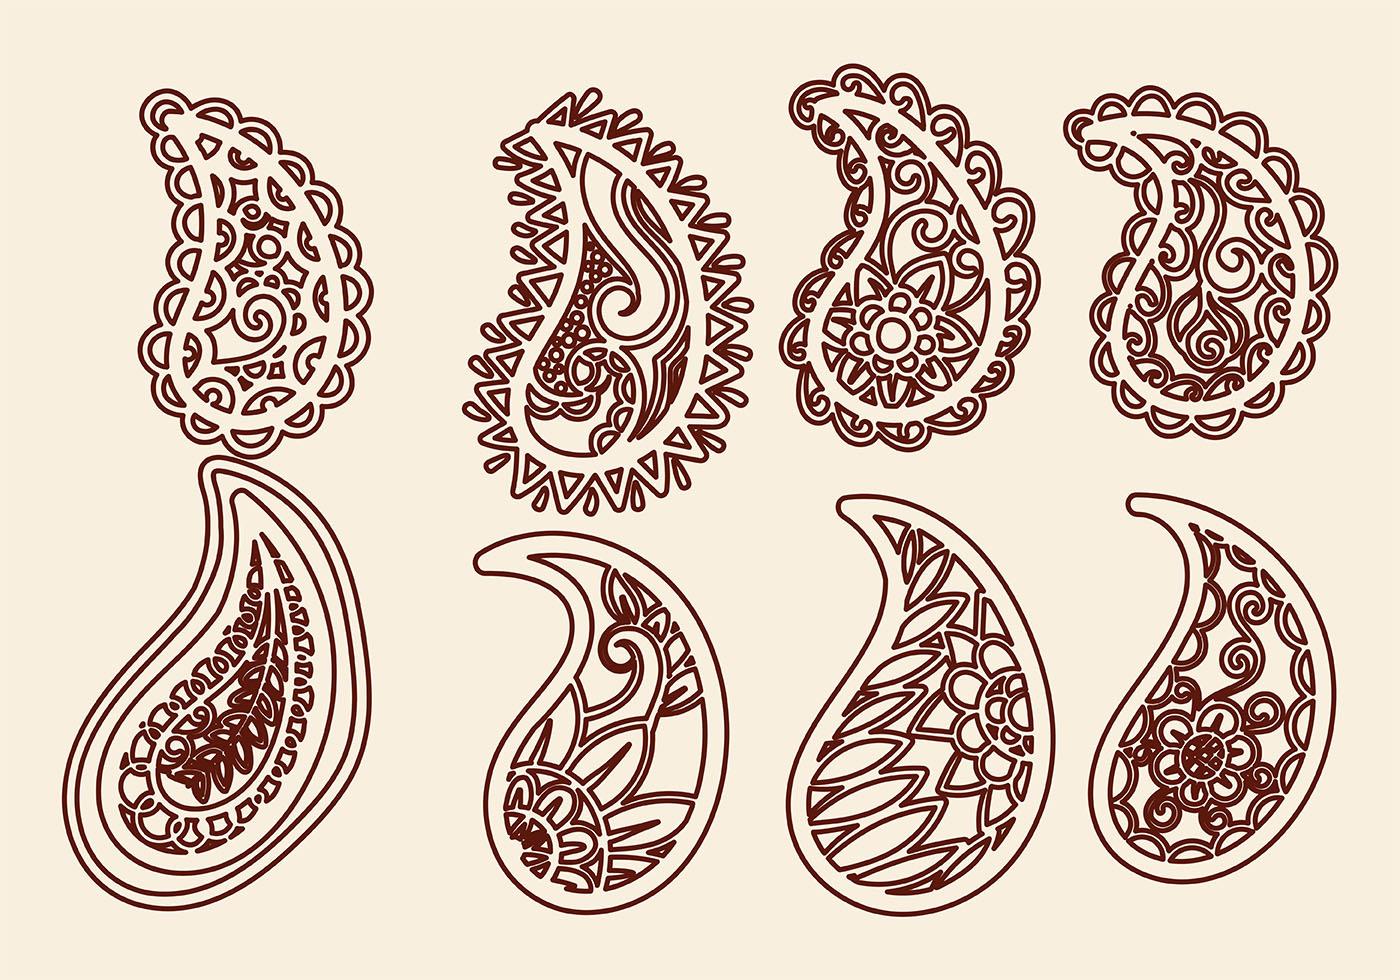 Paisley Free Vector Art - (15012 Free Downloads)